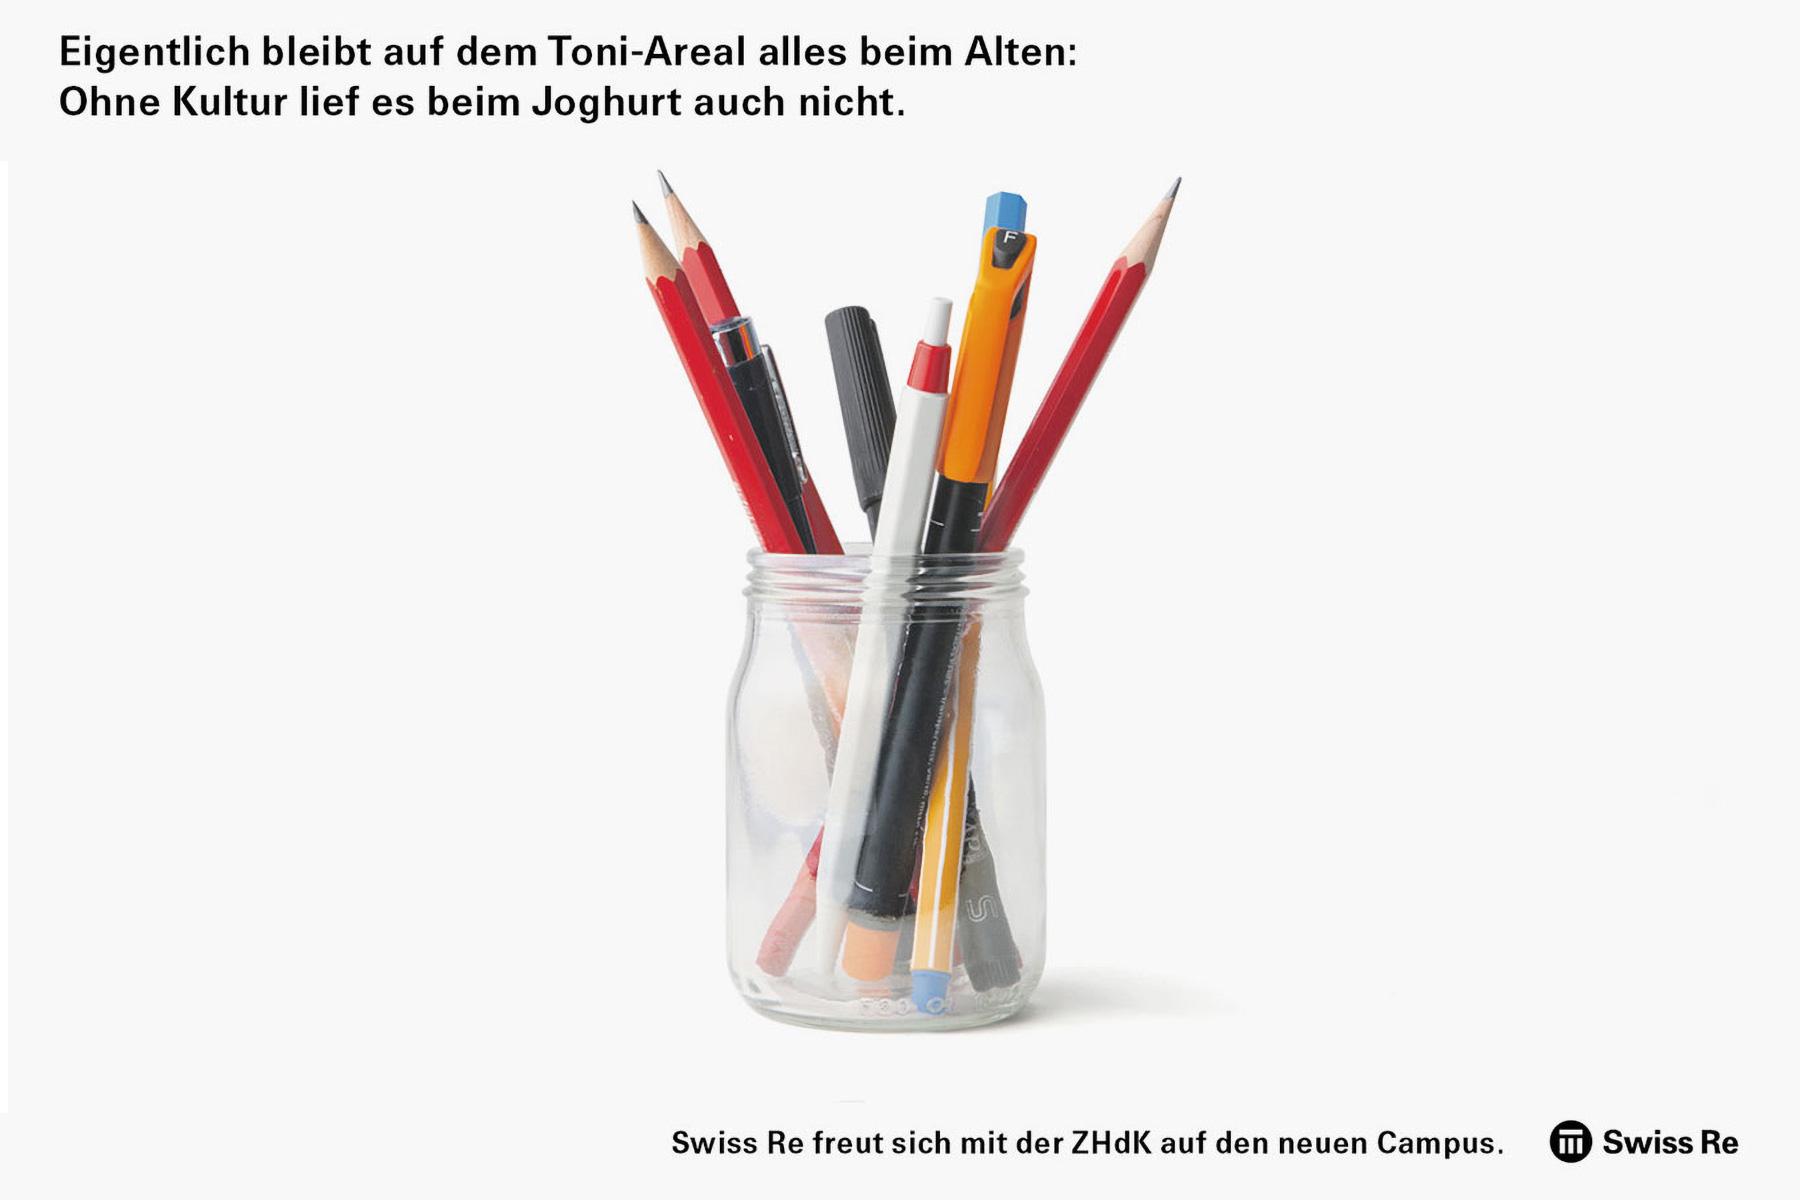 SwissRe Inserat Toni Areal Werbung